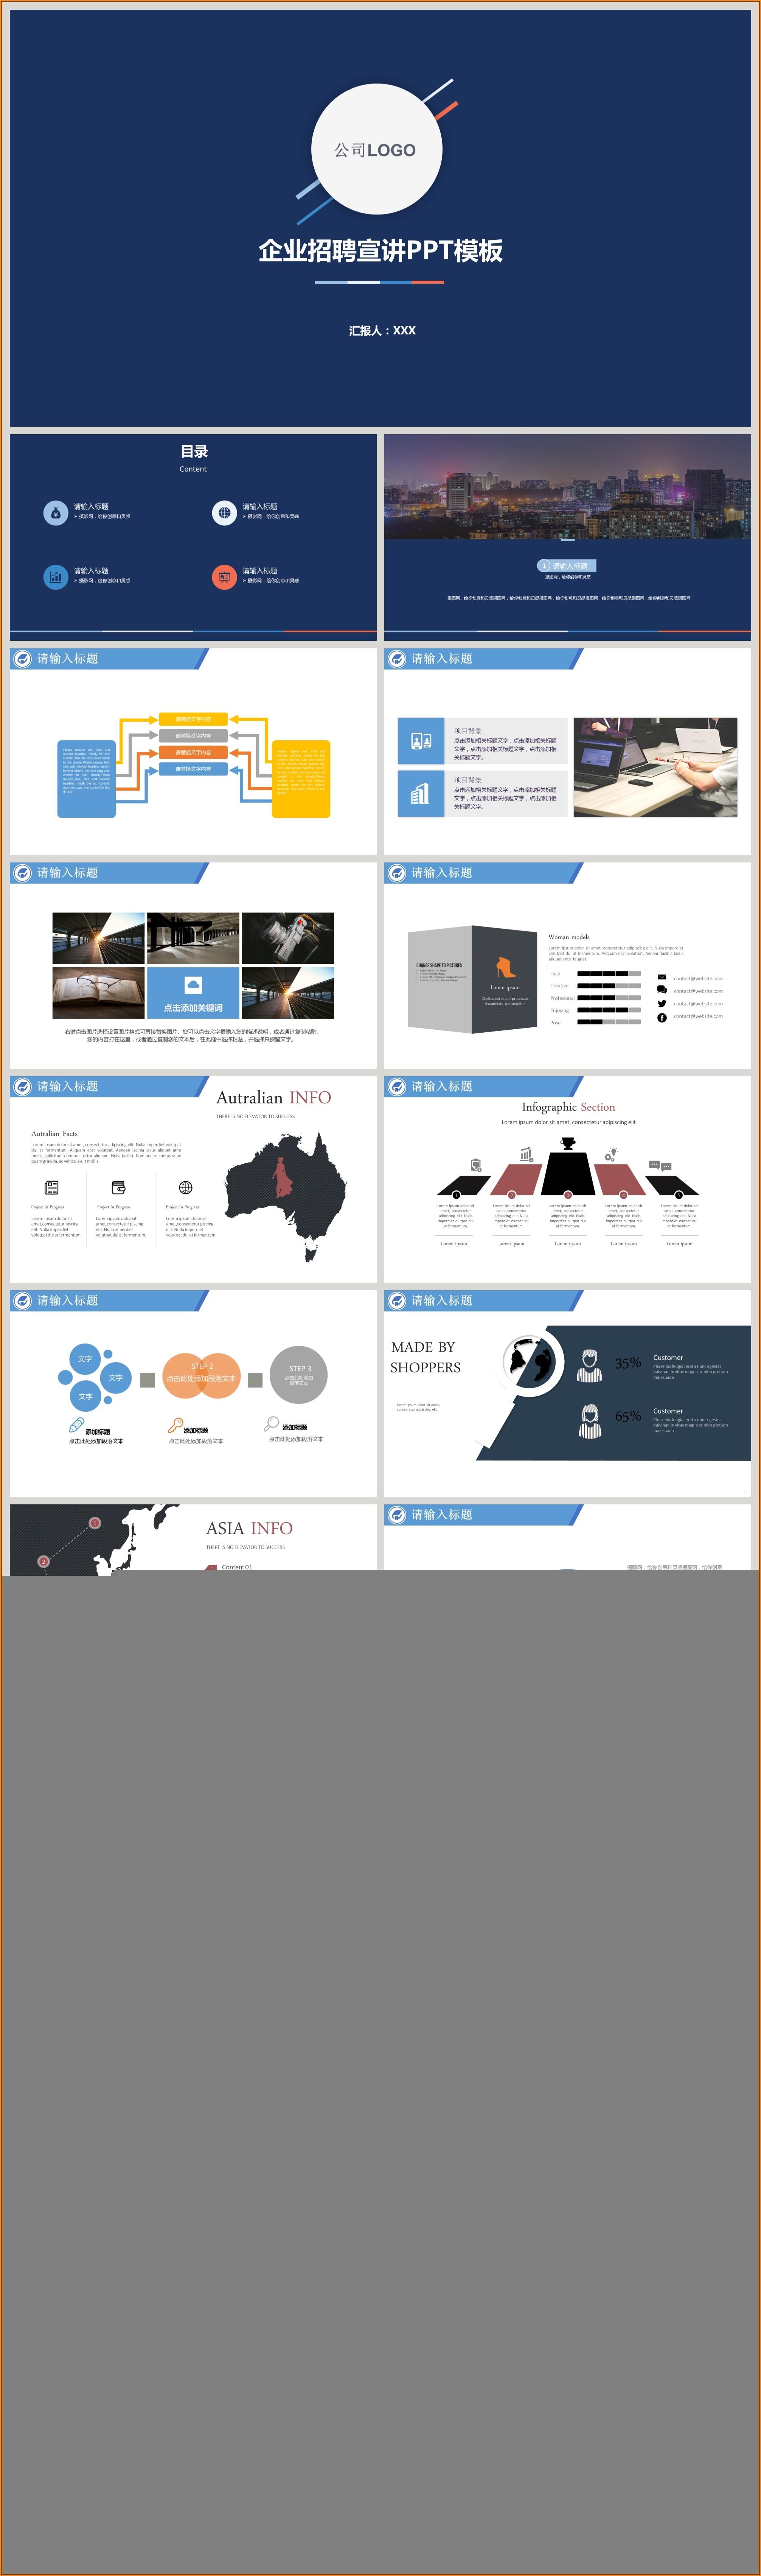 Business Roadmap Powerpoint Template Free